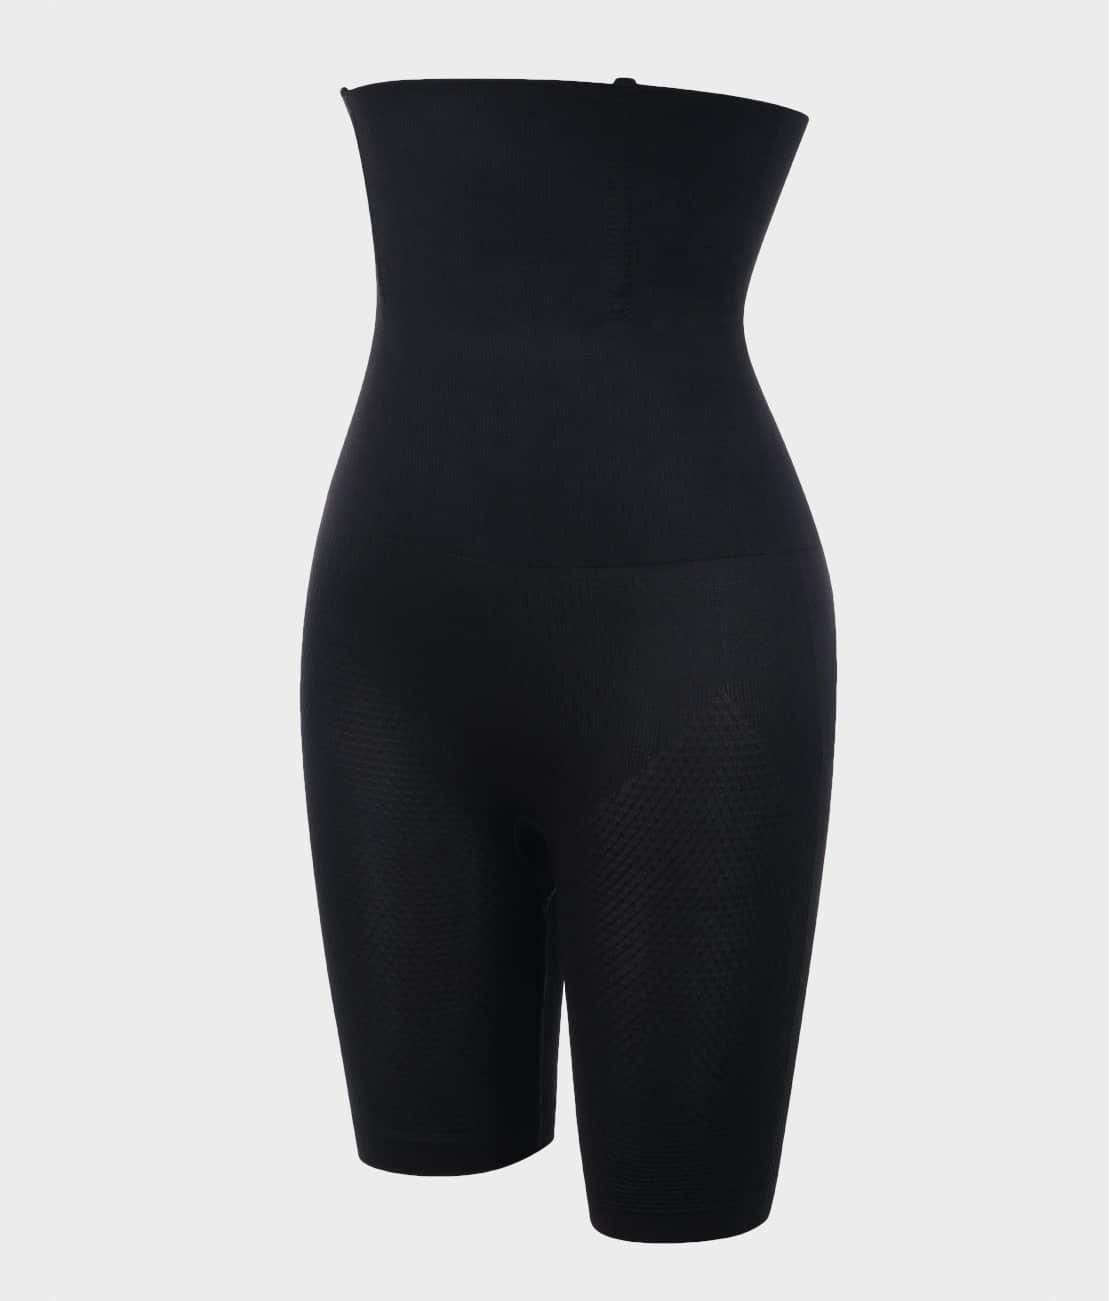 Panty Gainant noir